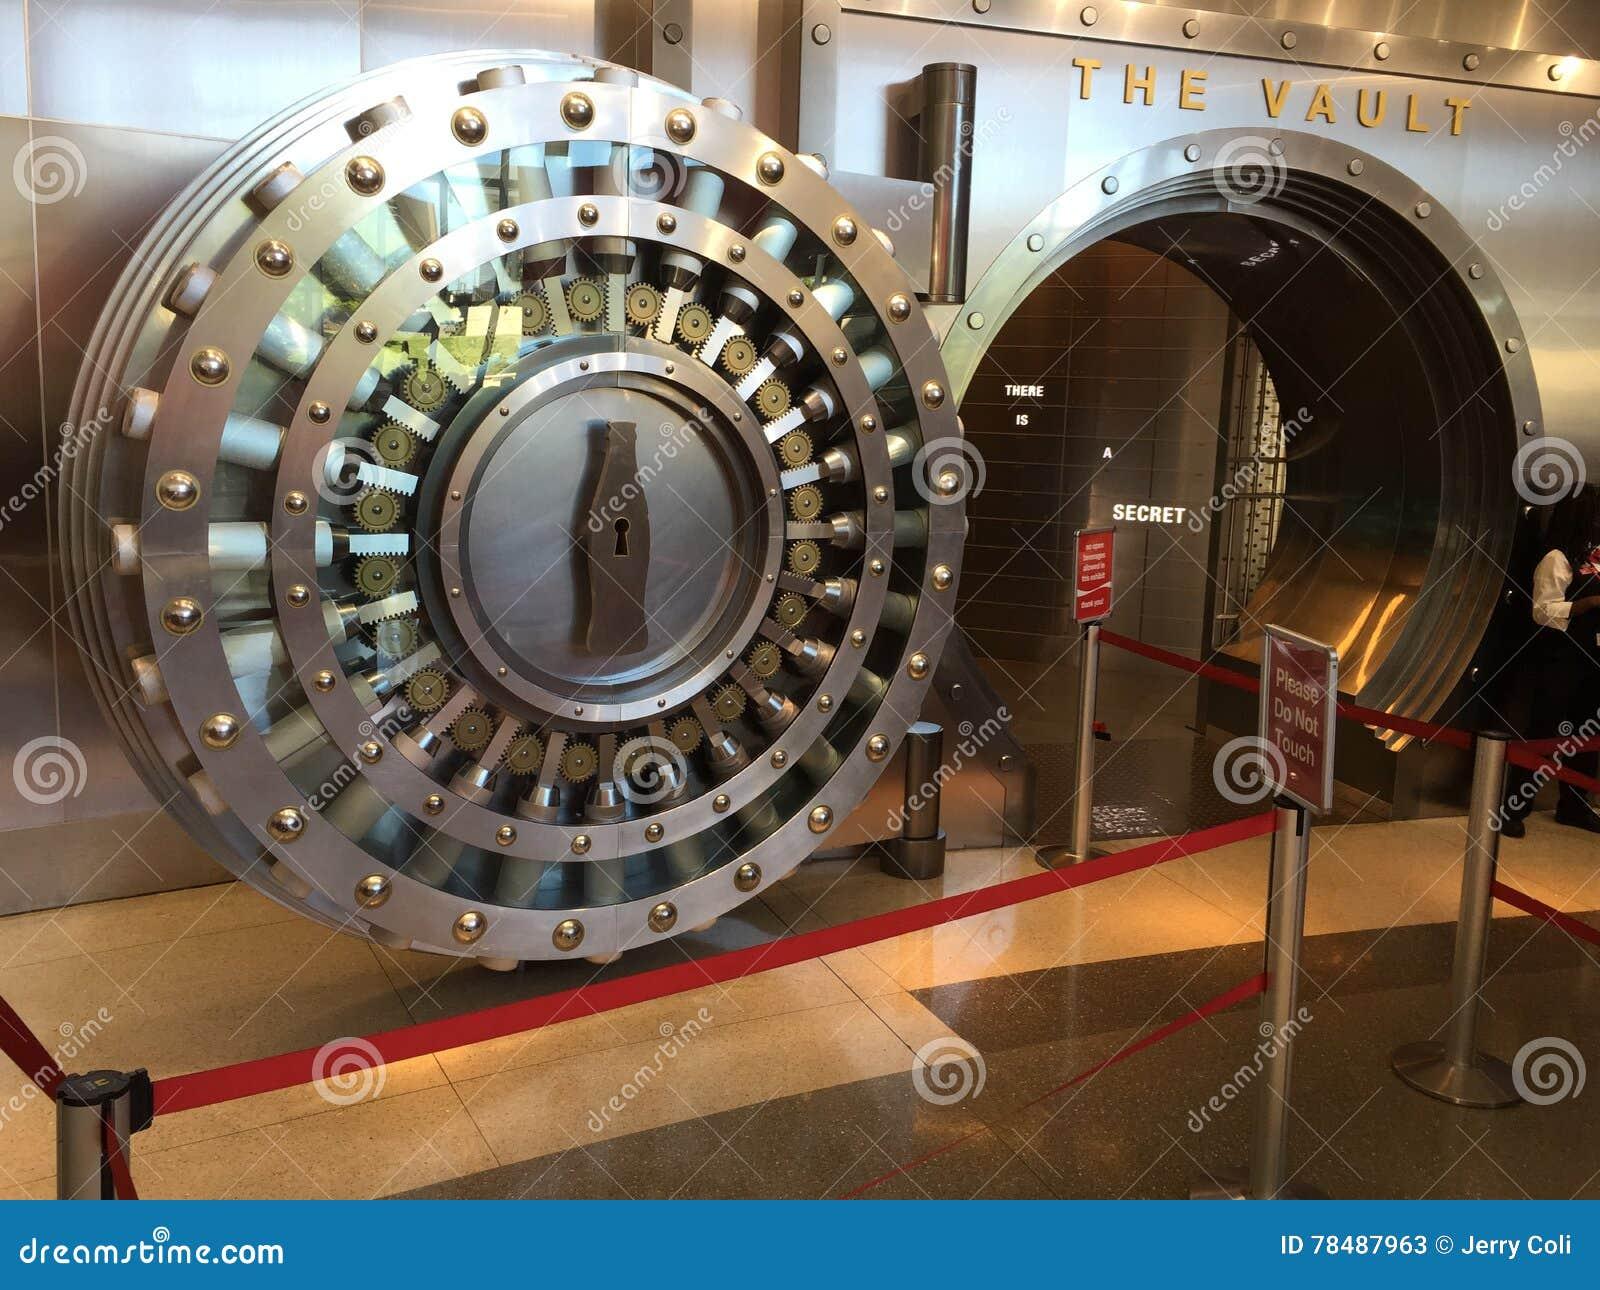 World of Coca-Cola vault  editorial stock photo  Image of tourism